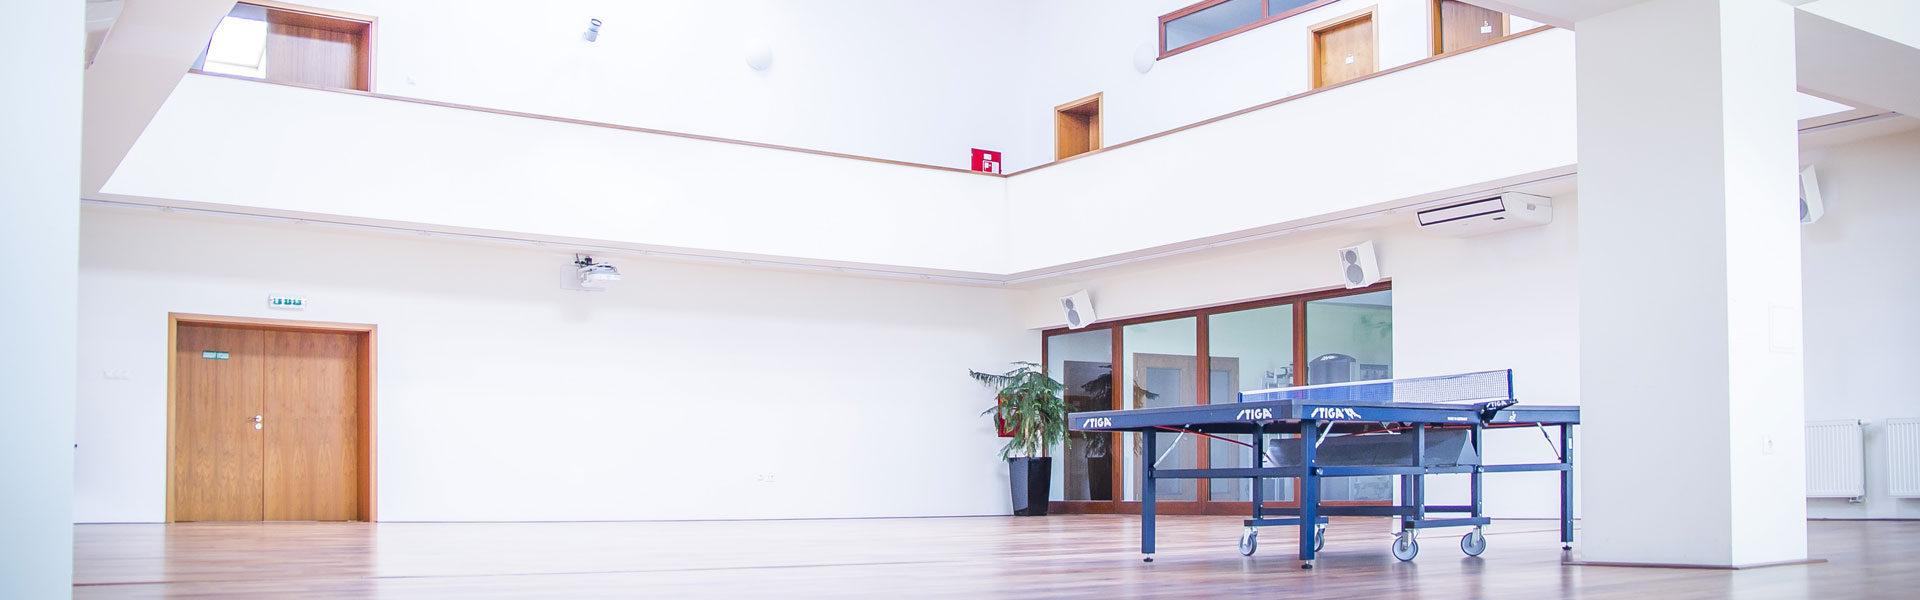 Meetingové centrum KIA Žilina